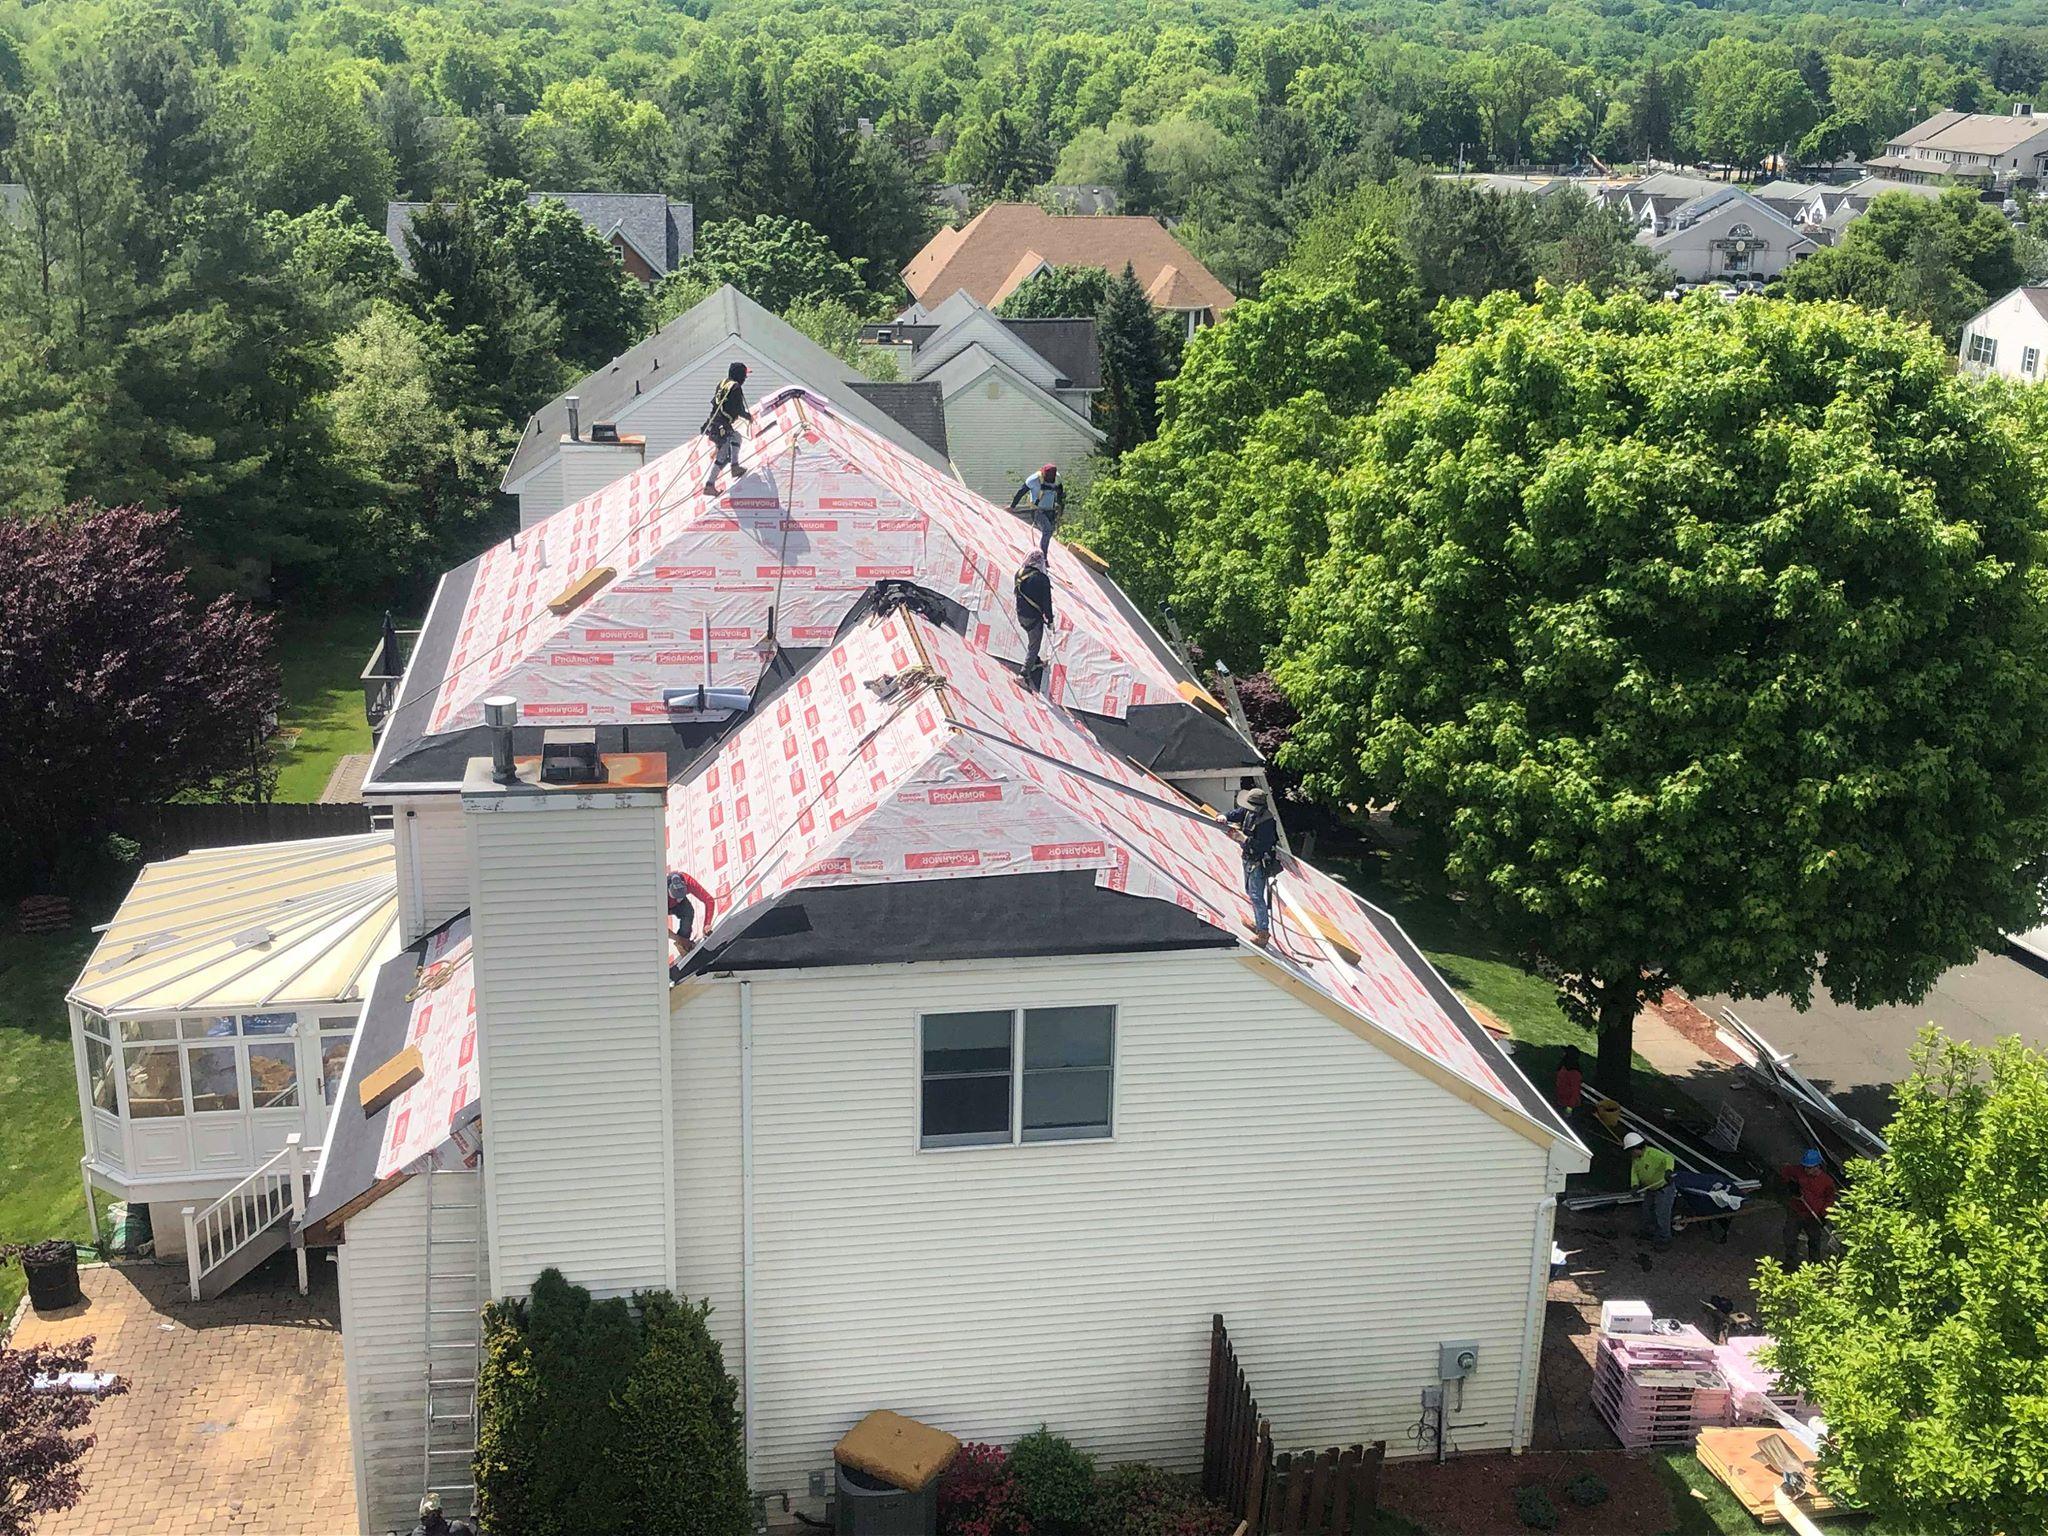 Warren NJ roofing Contractor Near Me Cephalo Roofing